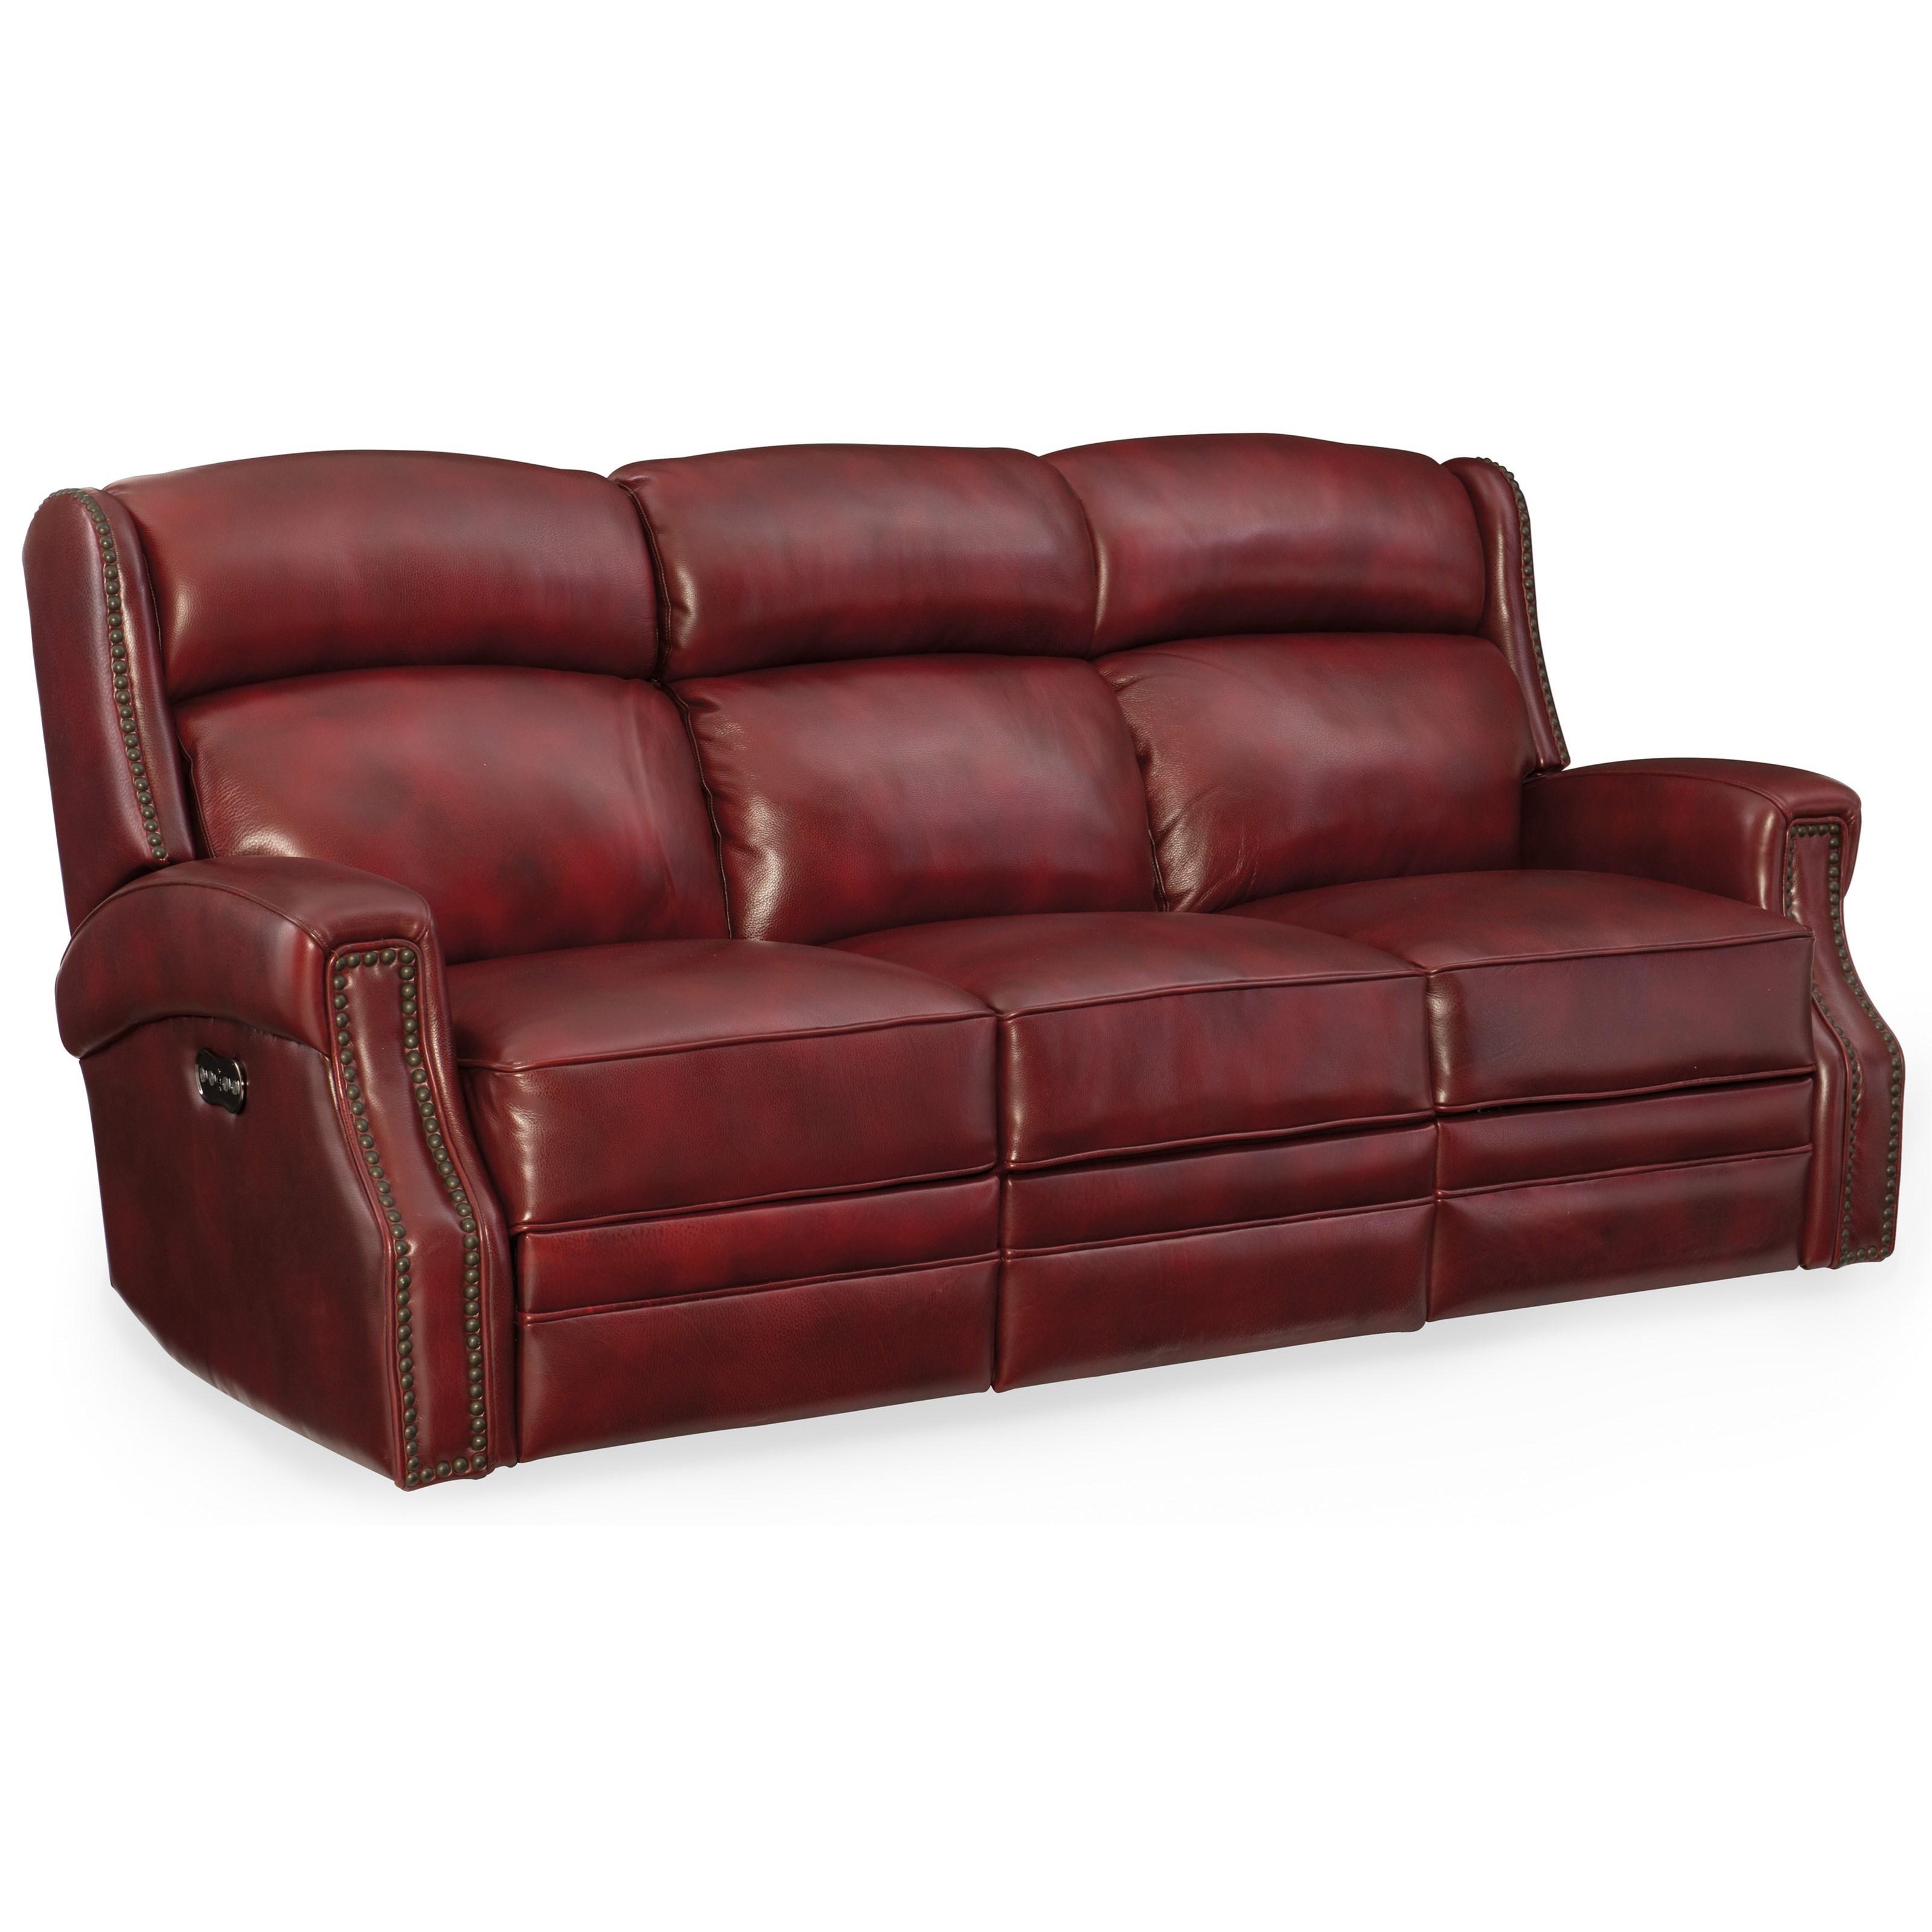 motion sofas designer sofa beds uk hamilton home carlisle power with